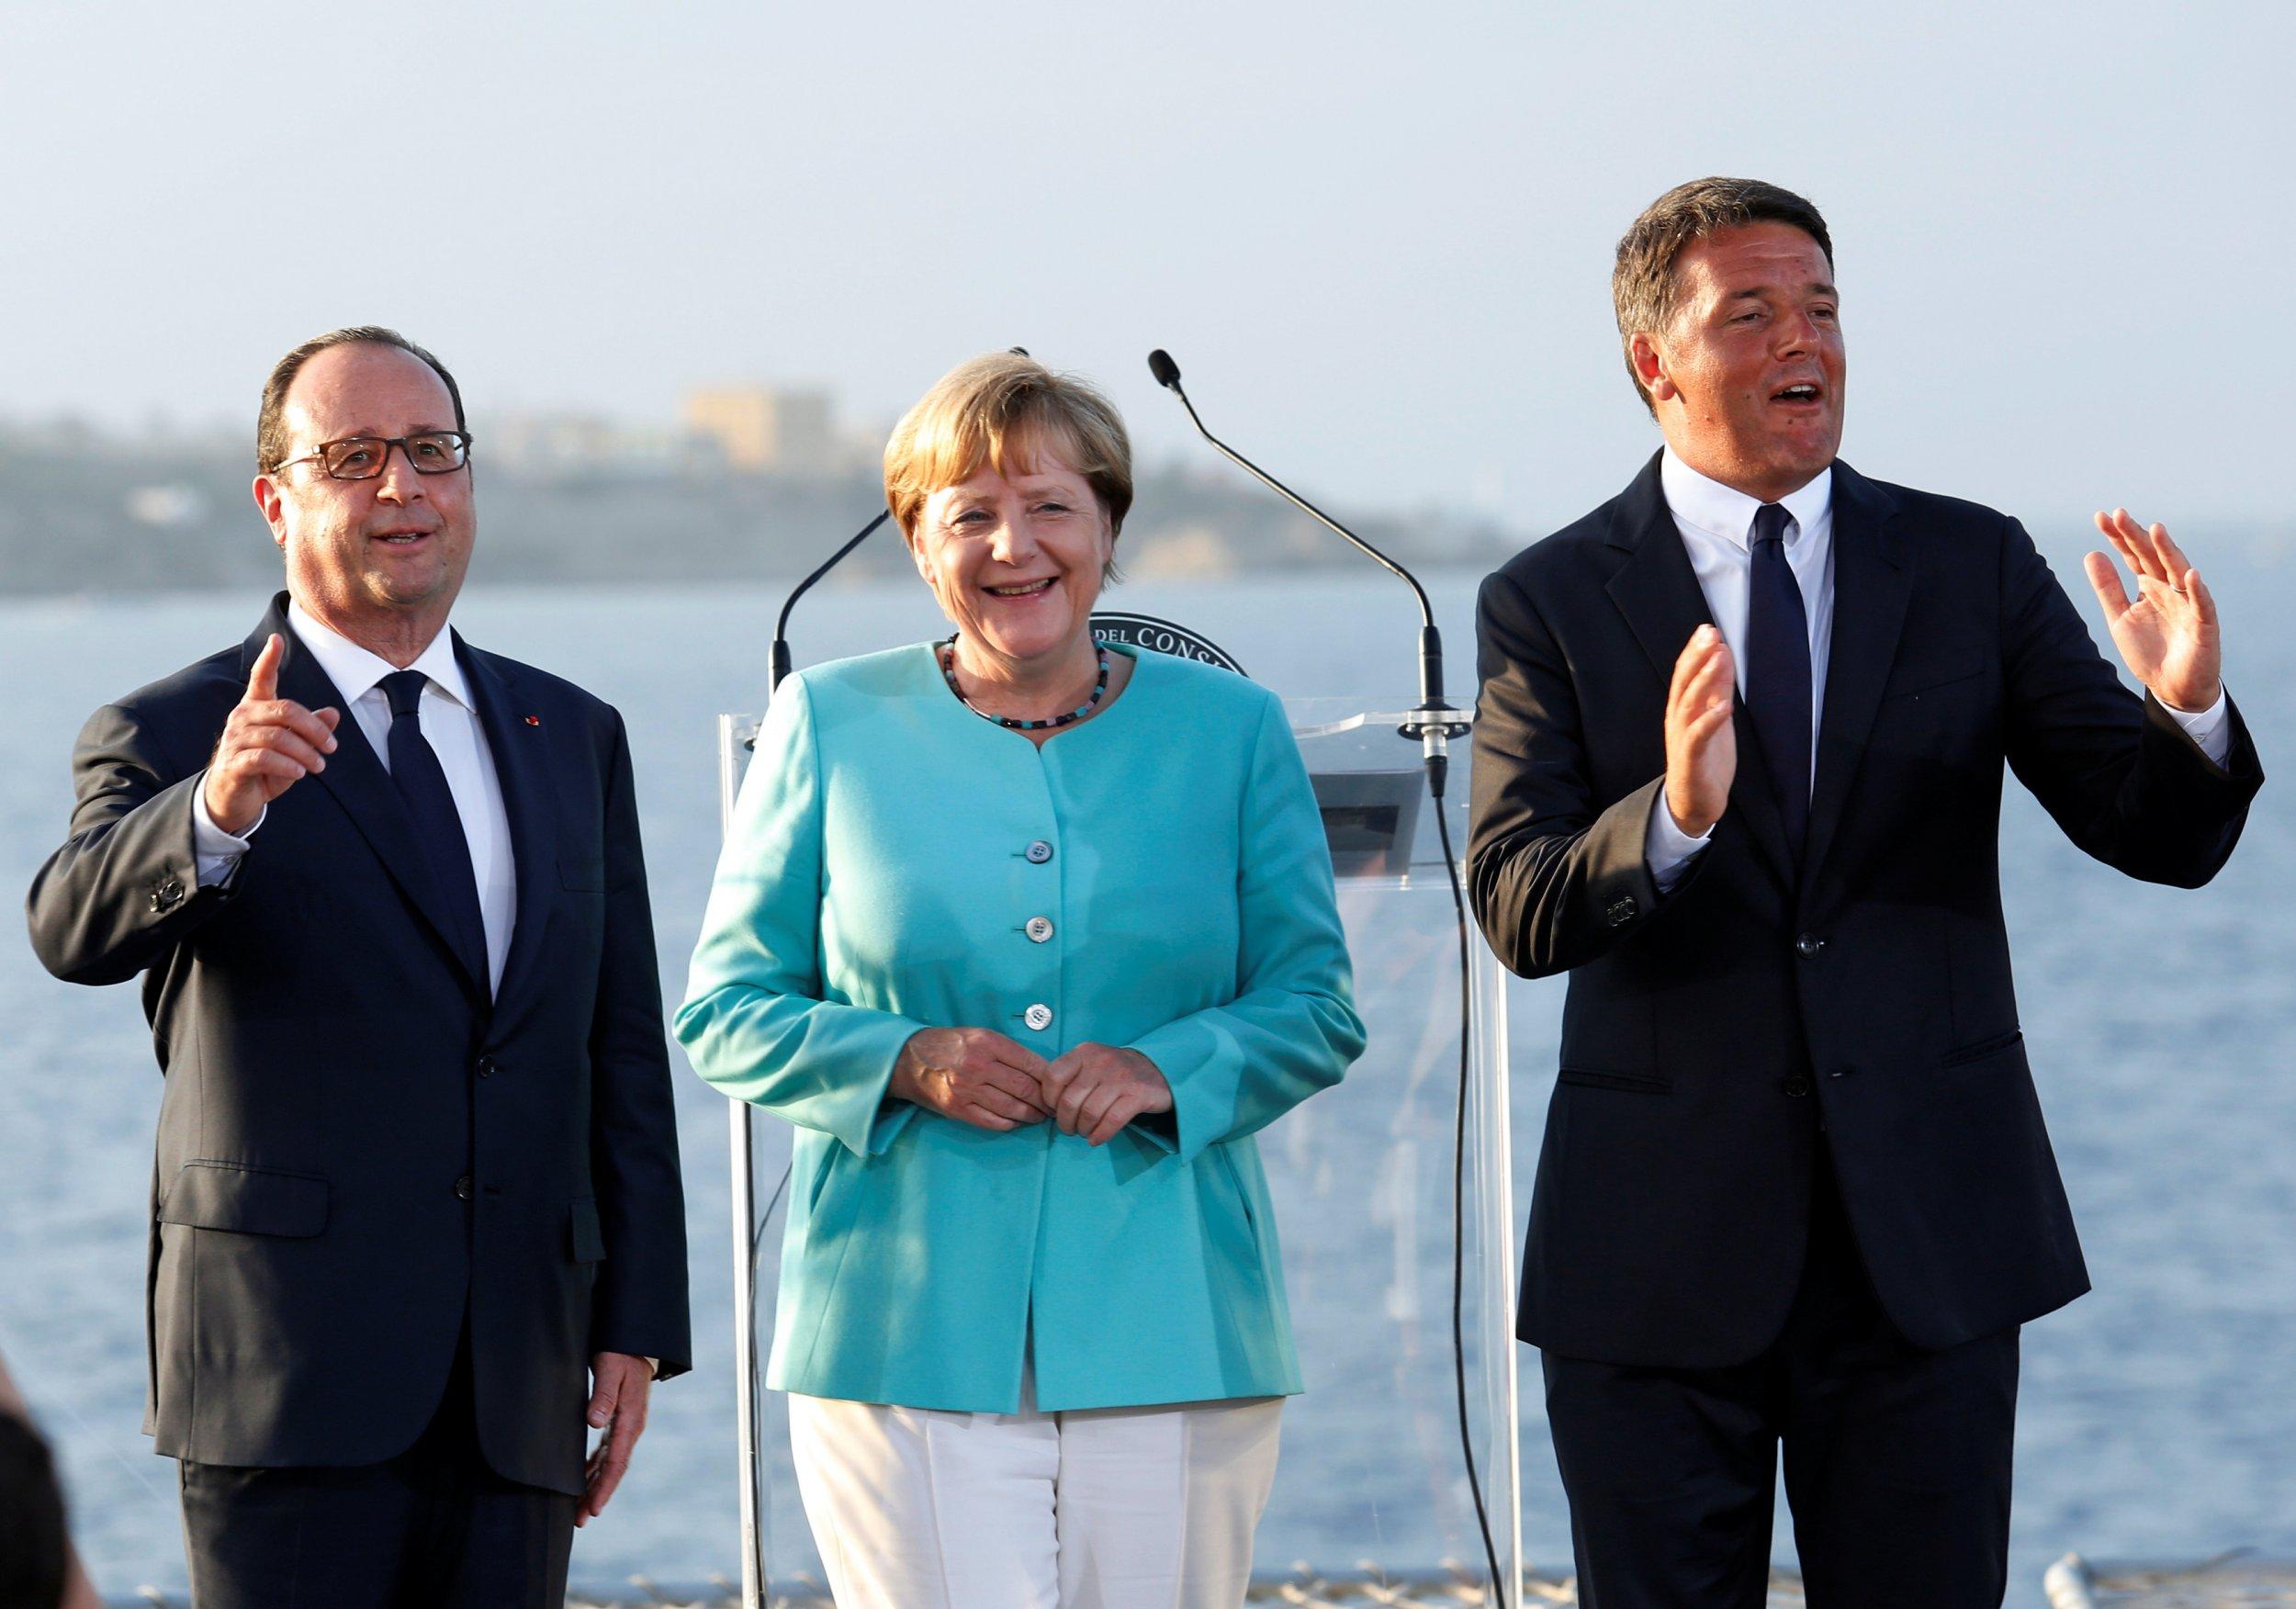 Matteo Renzi, Angela Merkel and Francois Hollande